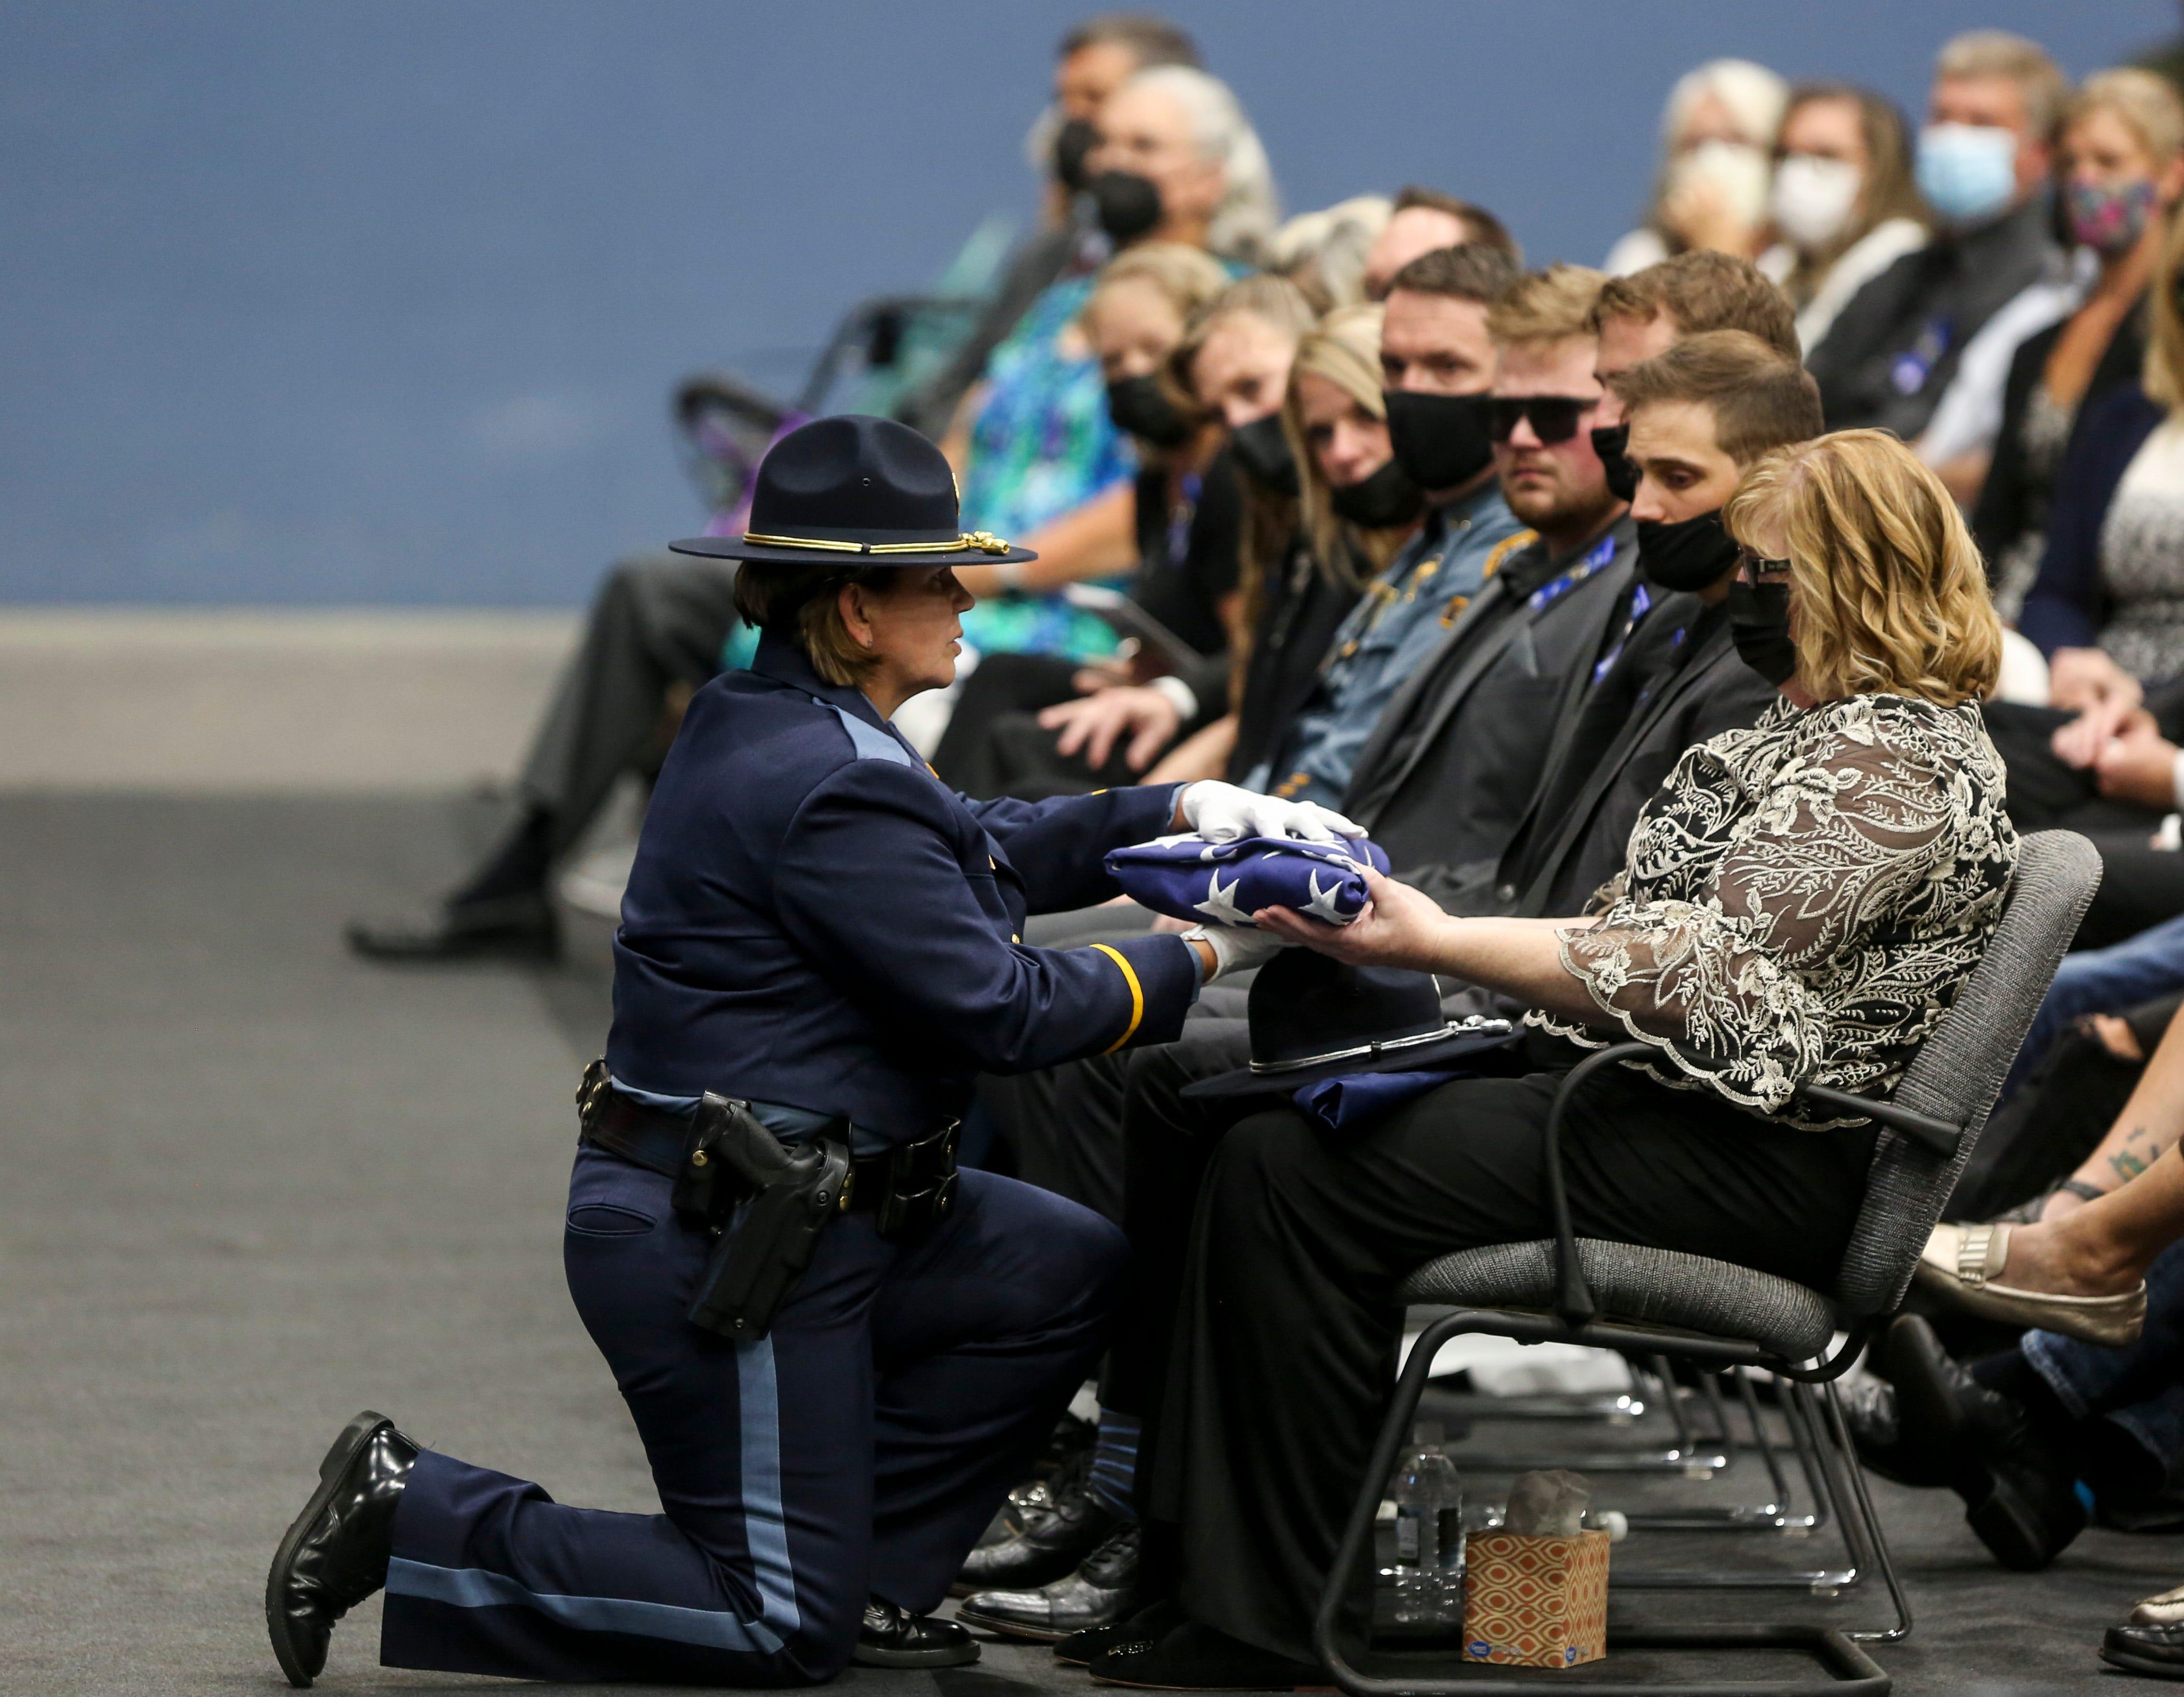 Procession, memorial service honor Oregon State Police Sgt. John Burright